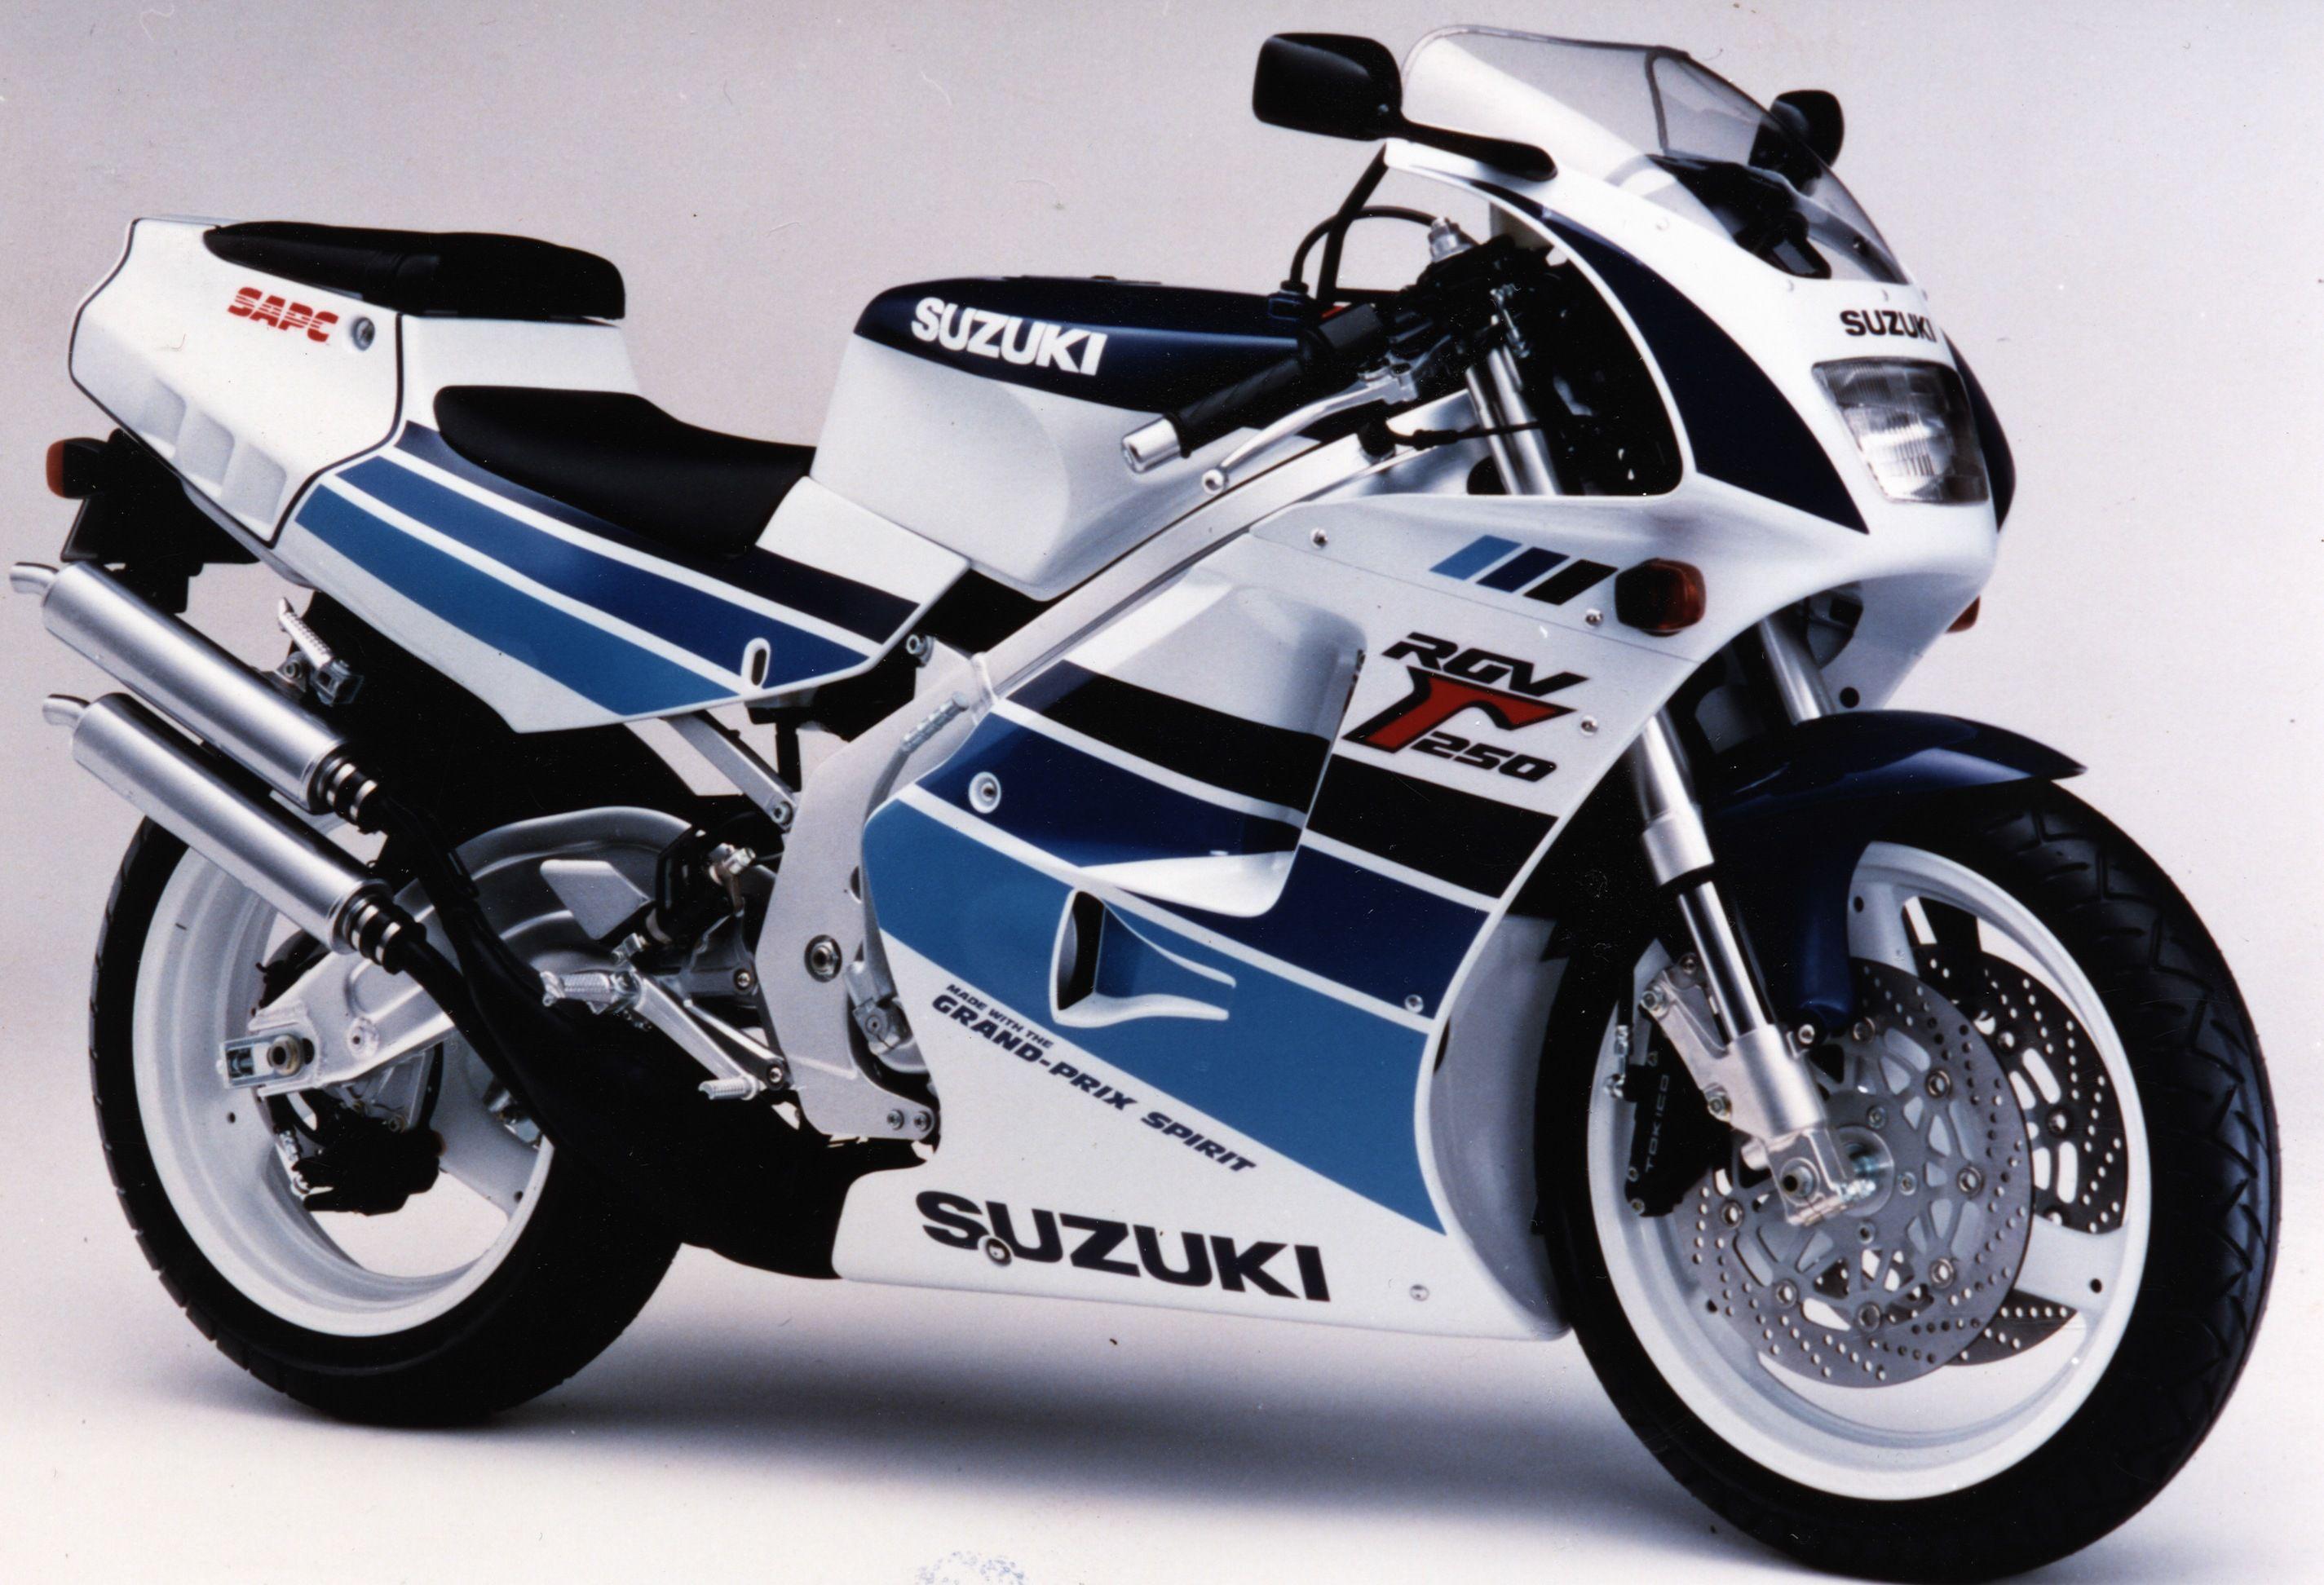 Suzuki RGV250 Modell 1991